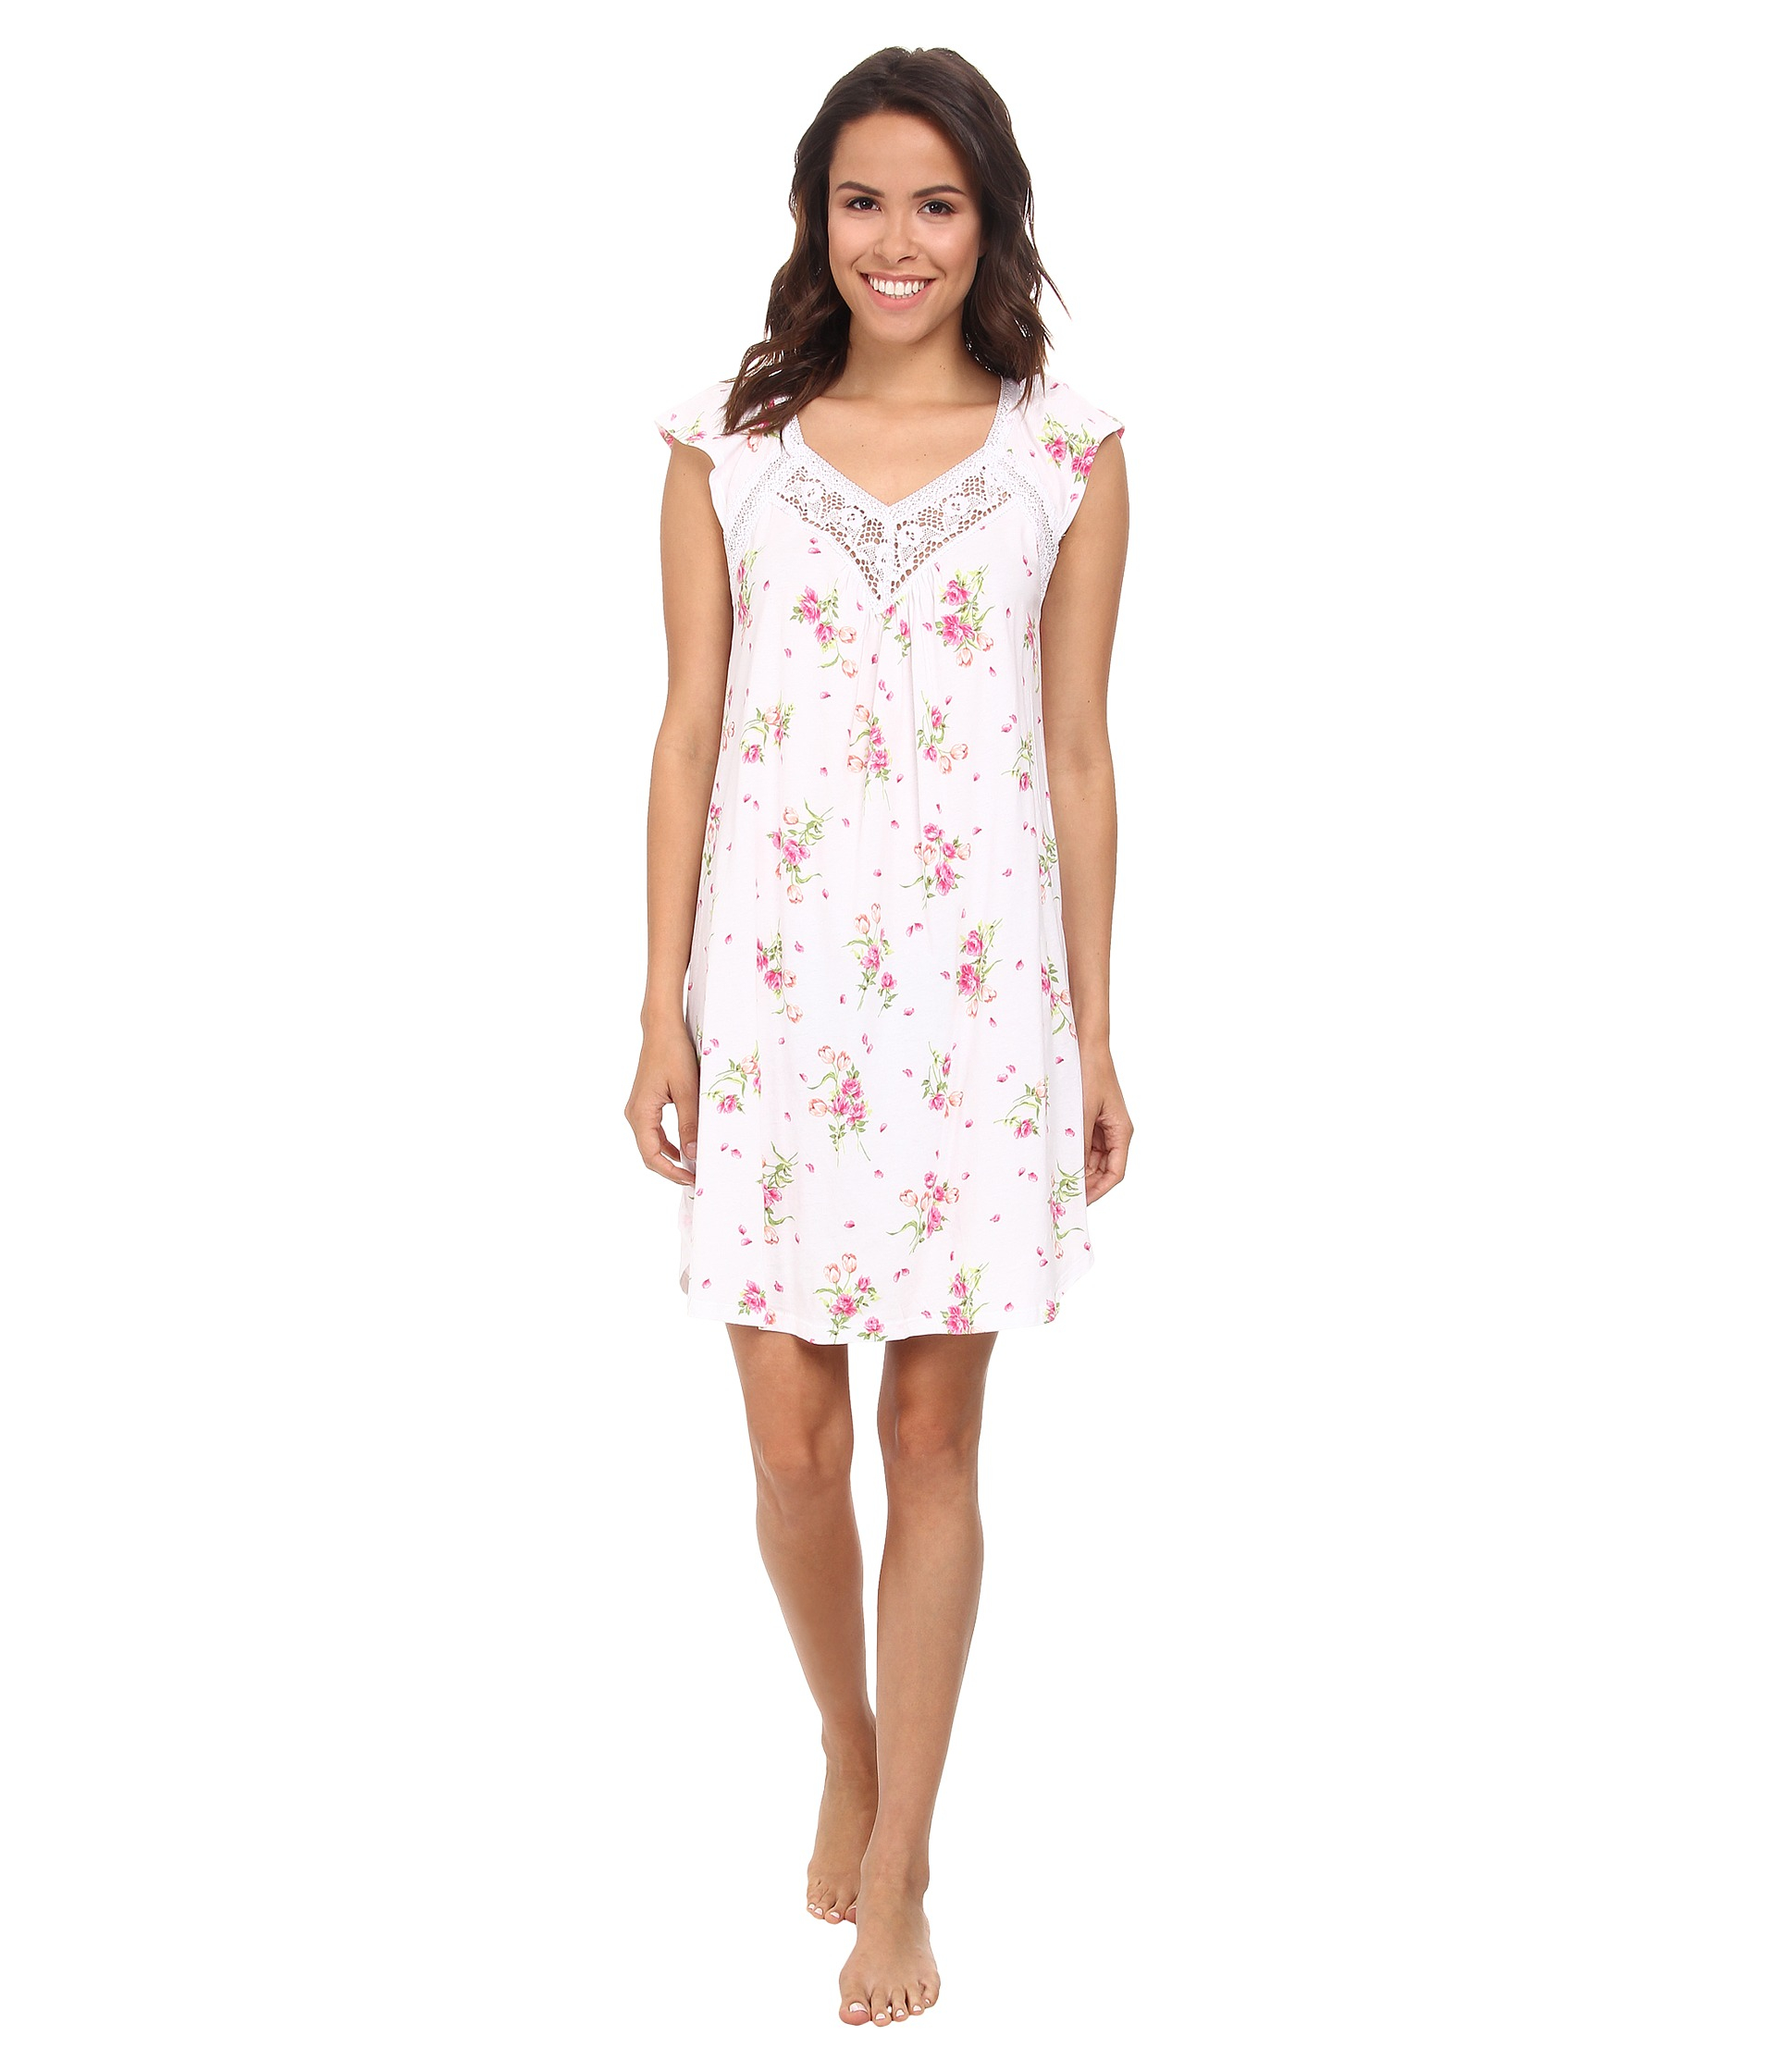 Lyst - Carole Hochman Floral Print Short Gown in White